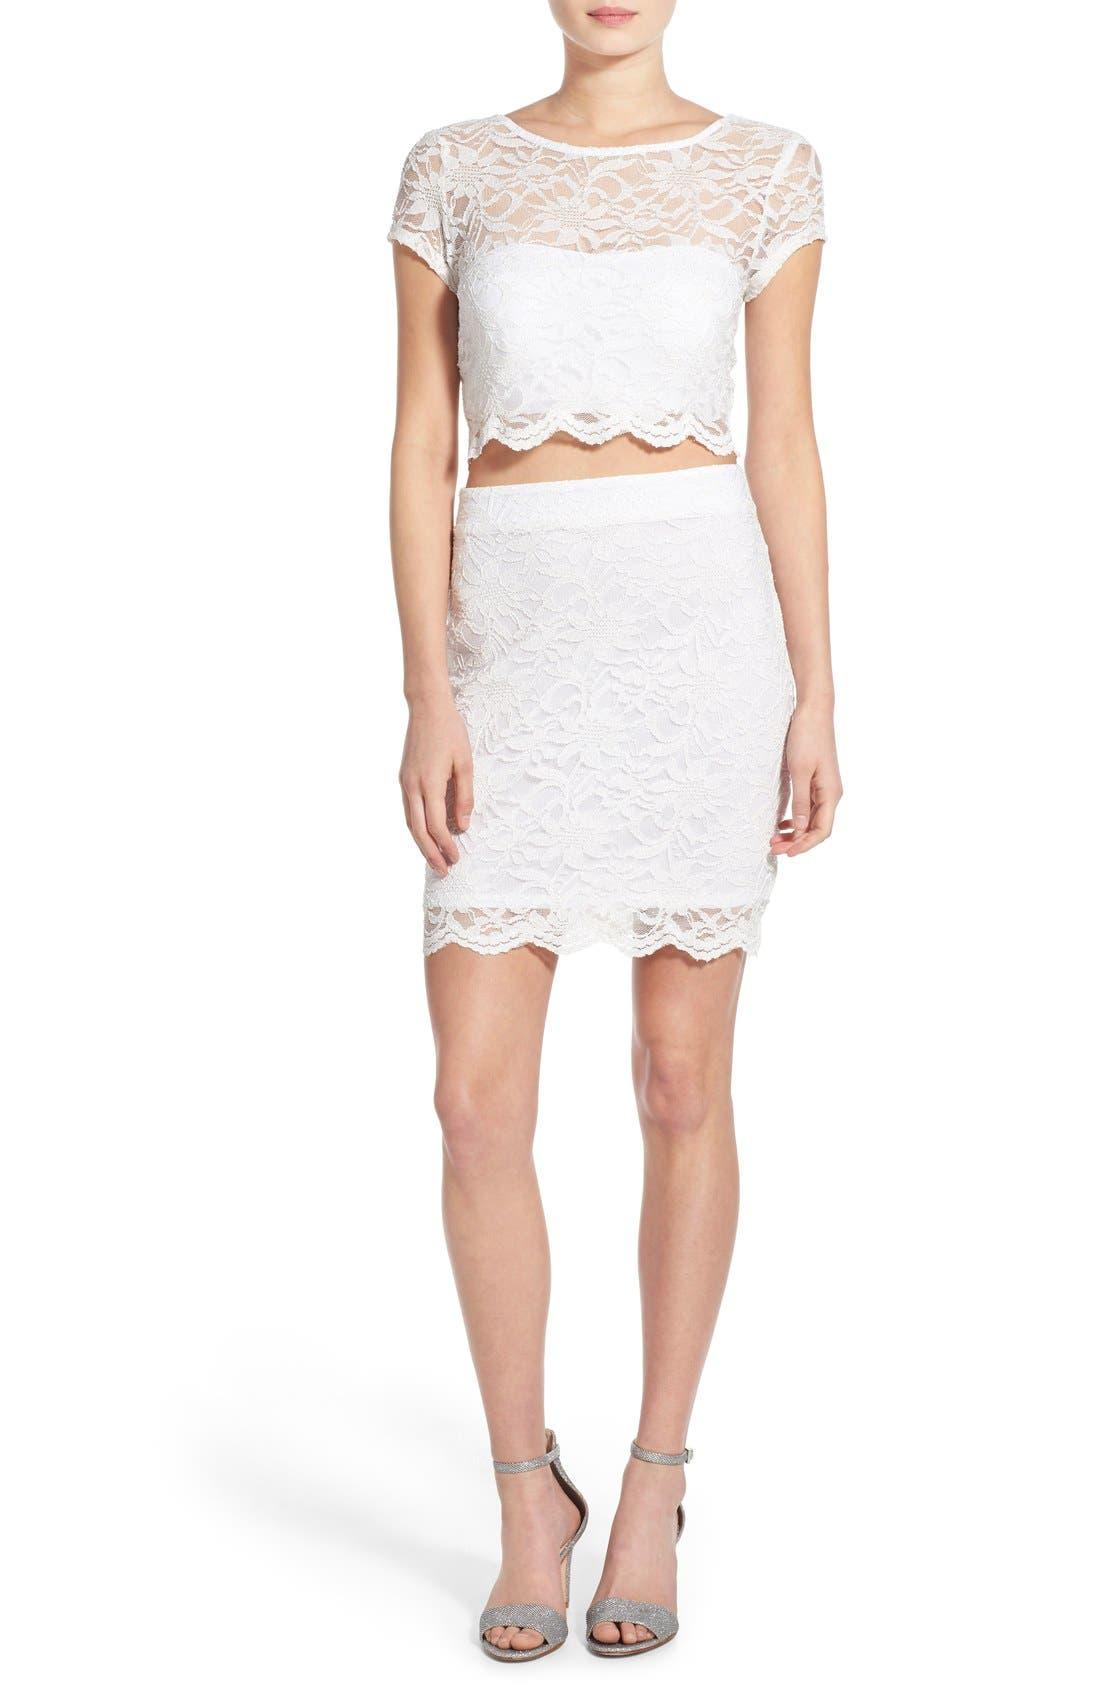 Alternate Image 1 Selected - Speechless Glitter Lace Two-Piece Sheath Dress